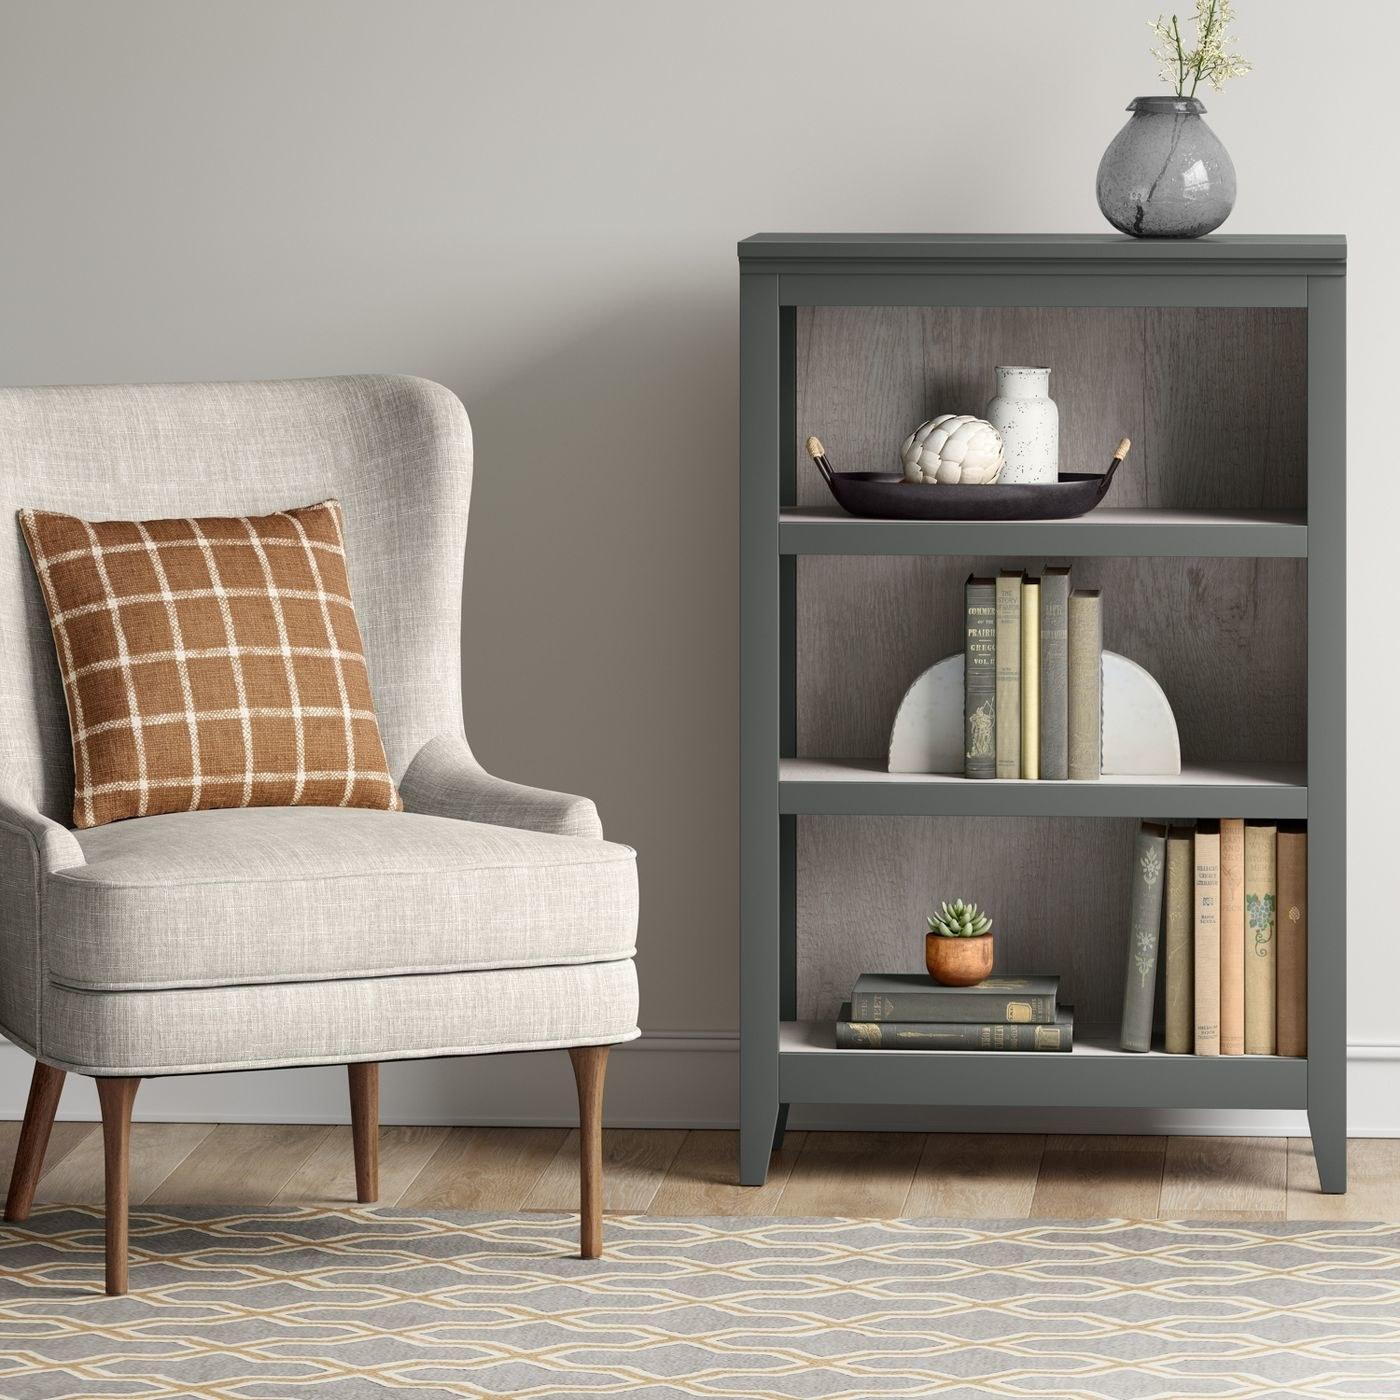 The bookcase in gray